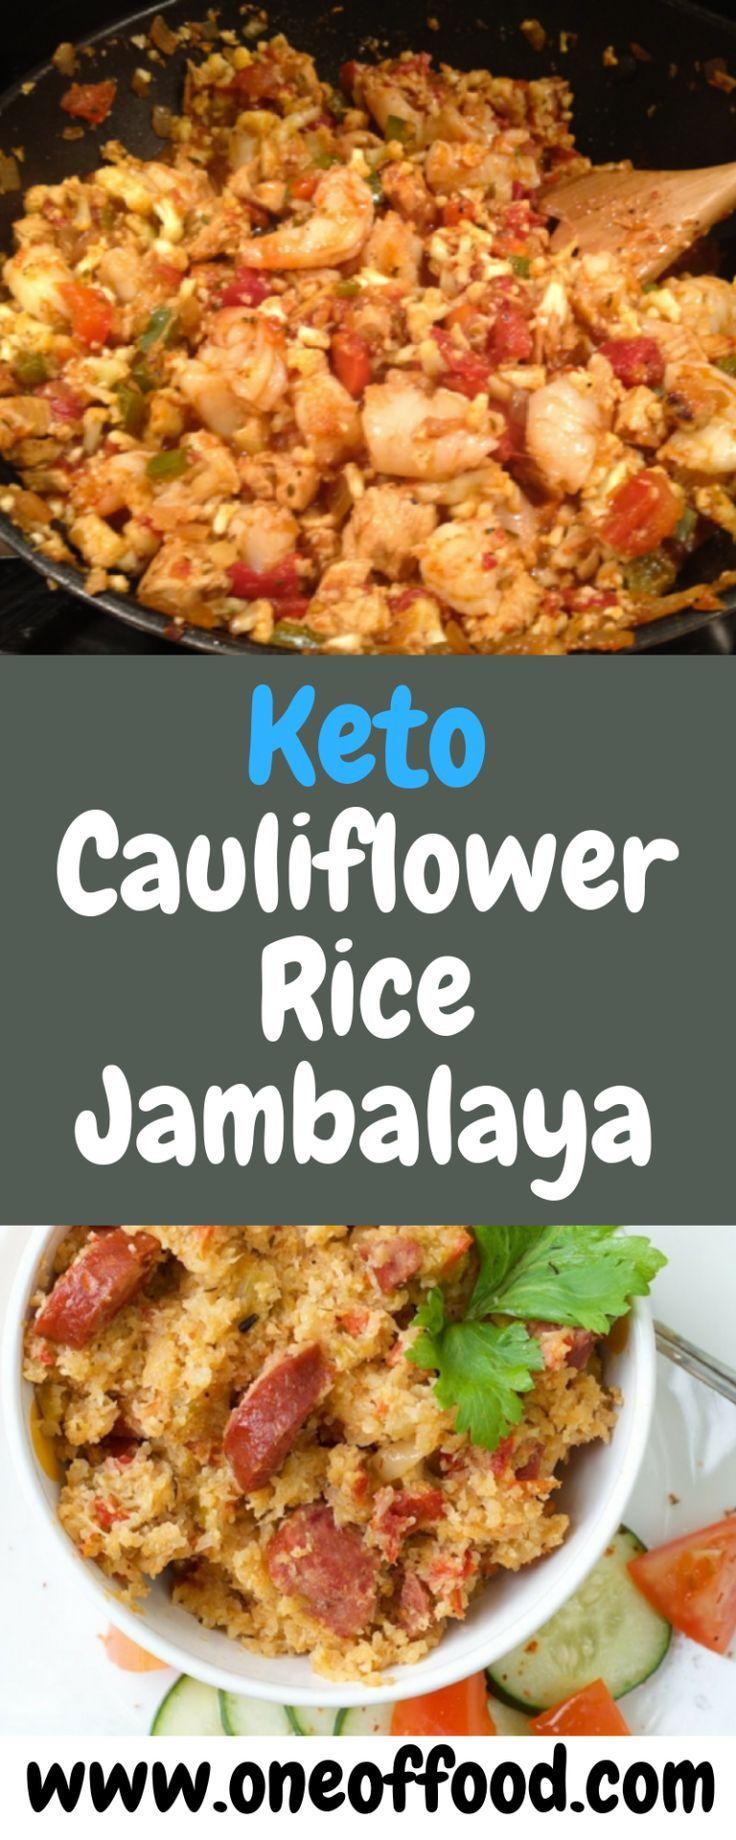 Keto Cauliflower Rice Jambalaya - One of food -   22 riced cauliflower recipes ideas